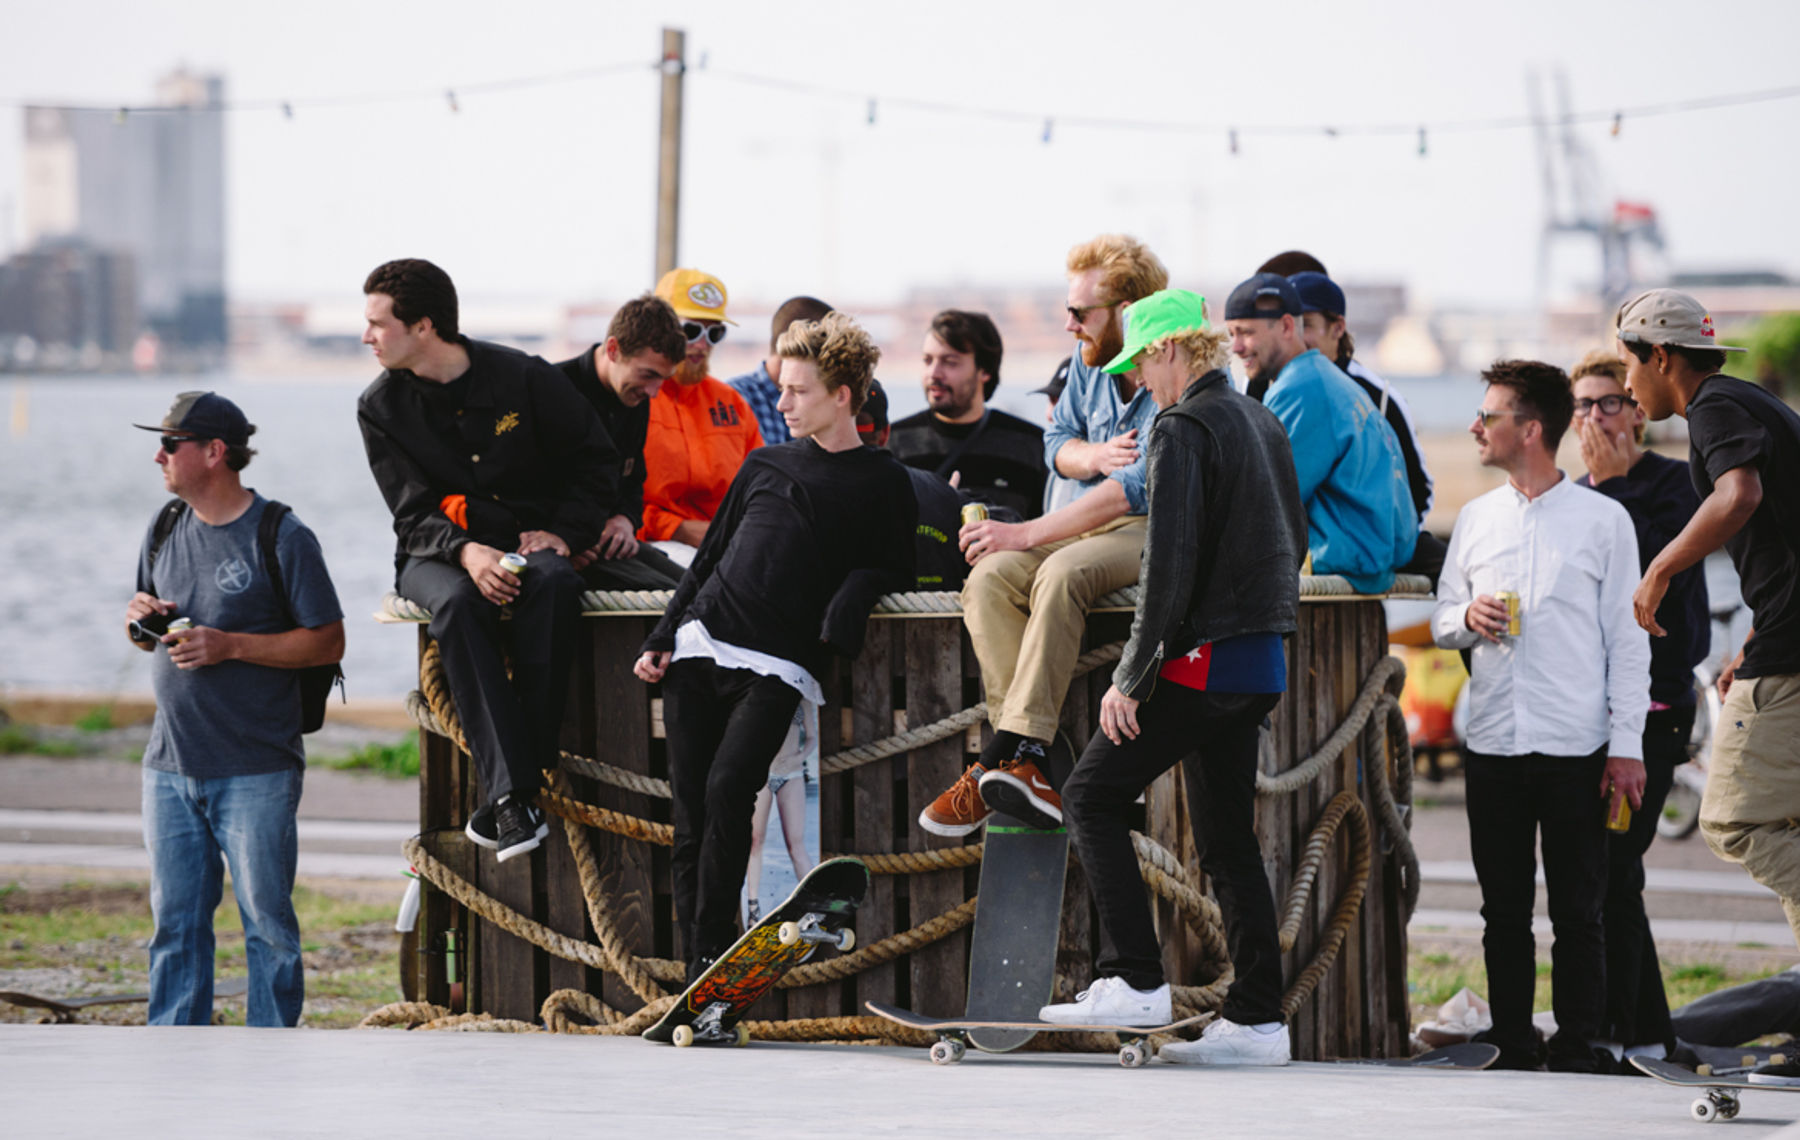 _IHC5819e-Nike-SB-Copenhagen-Open-Day-4-July-2015-Photographer-Maksim-Kalanep